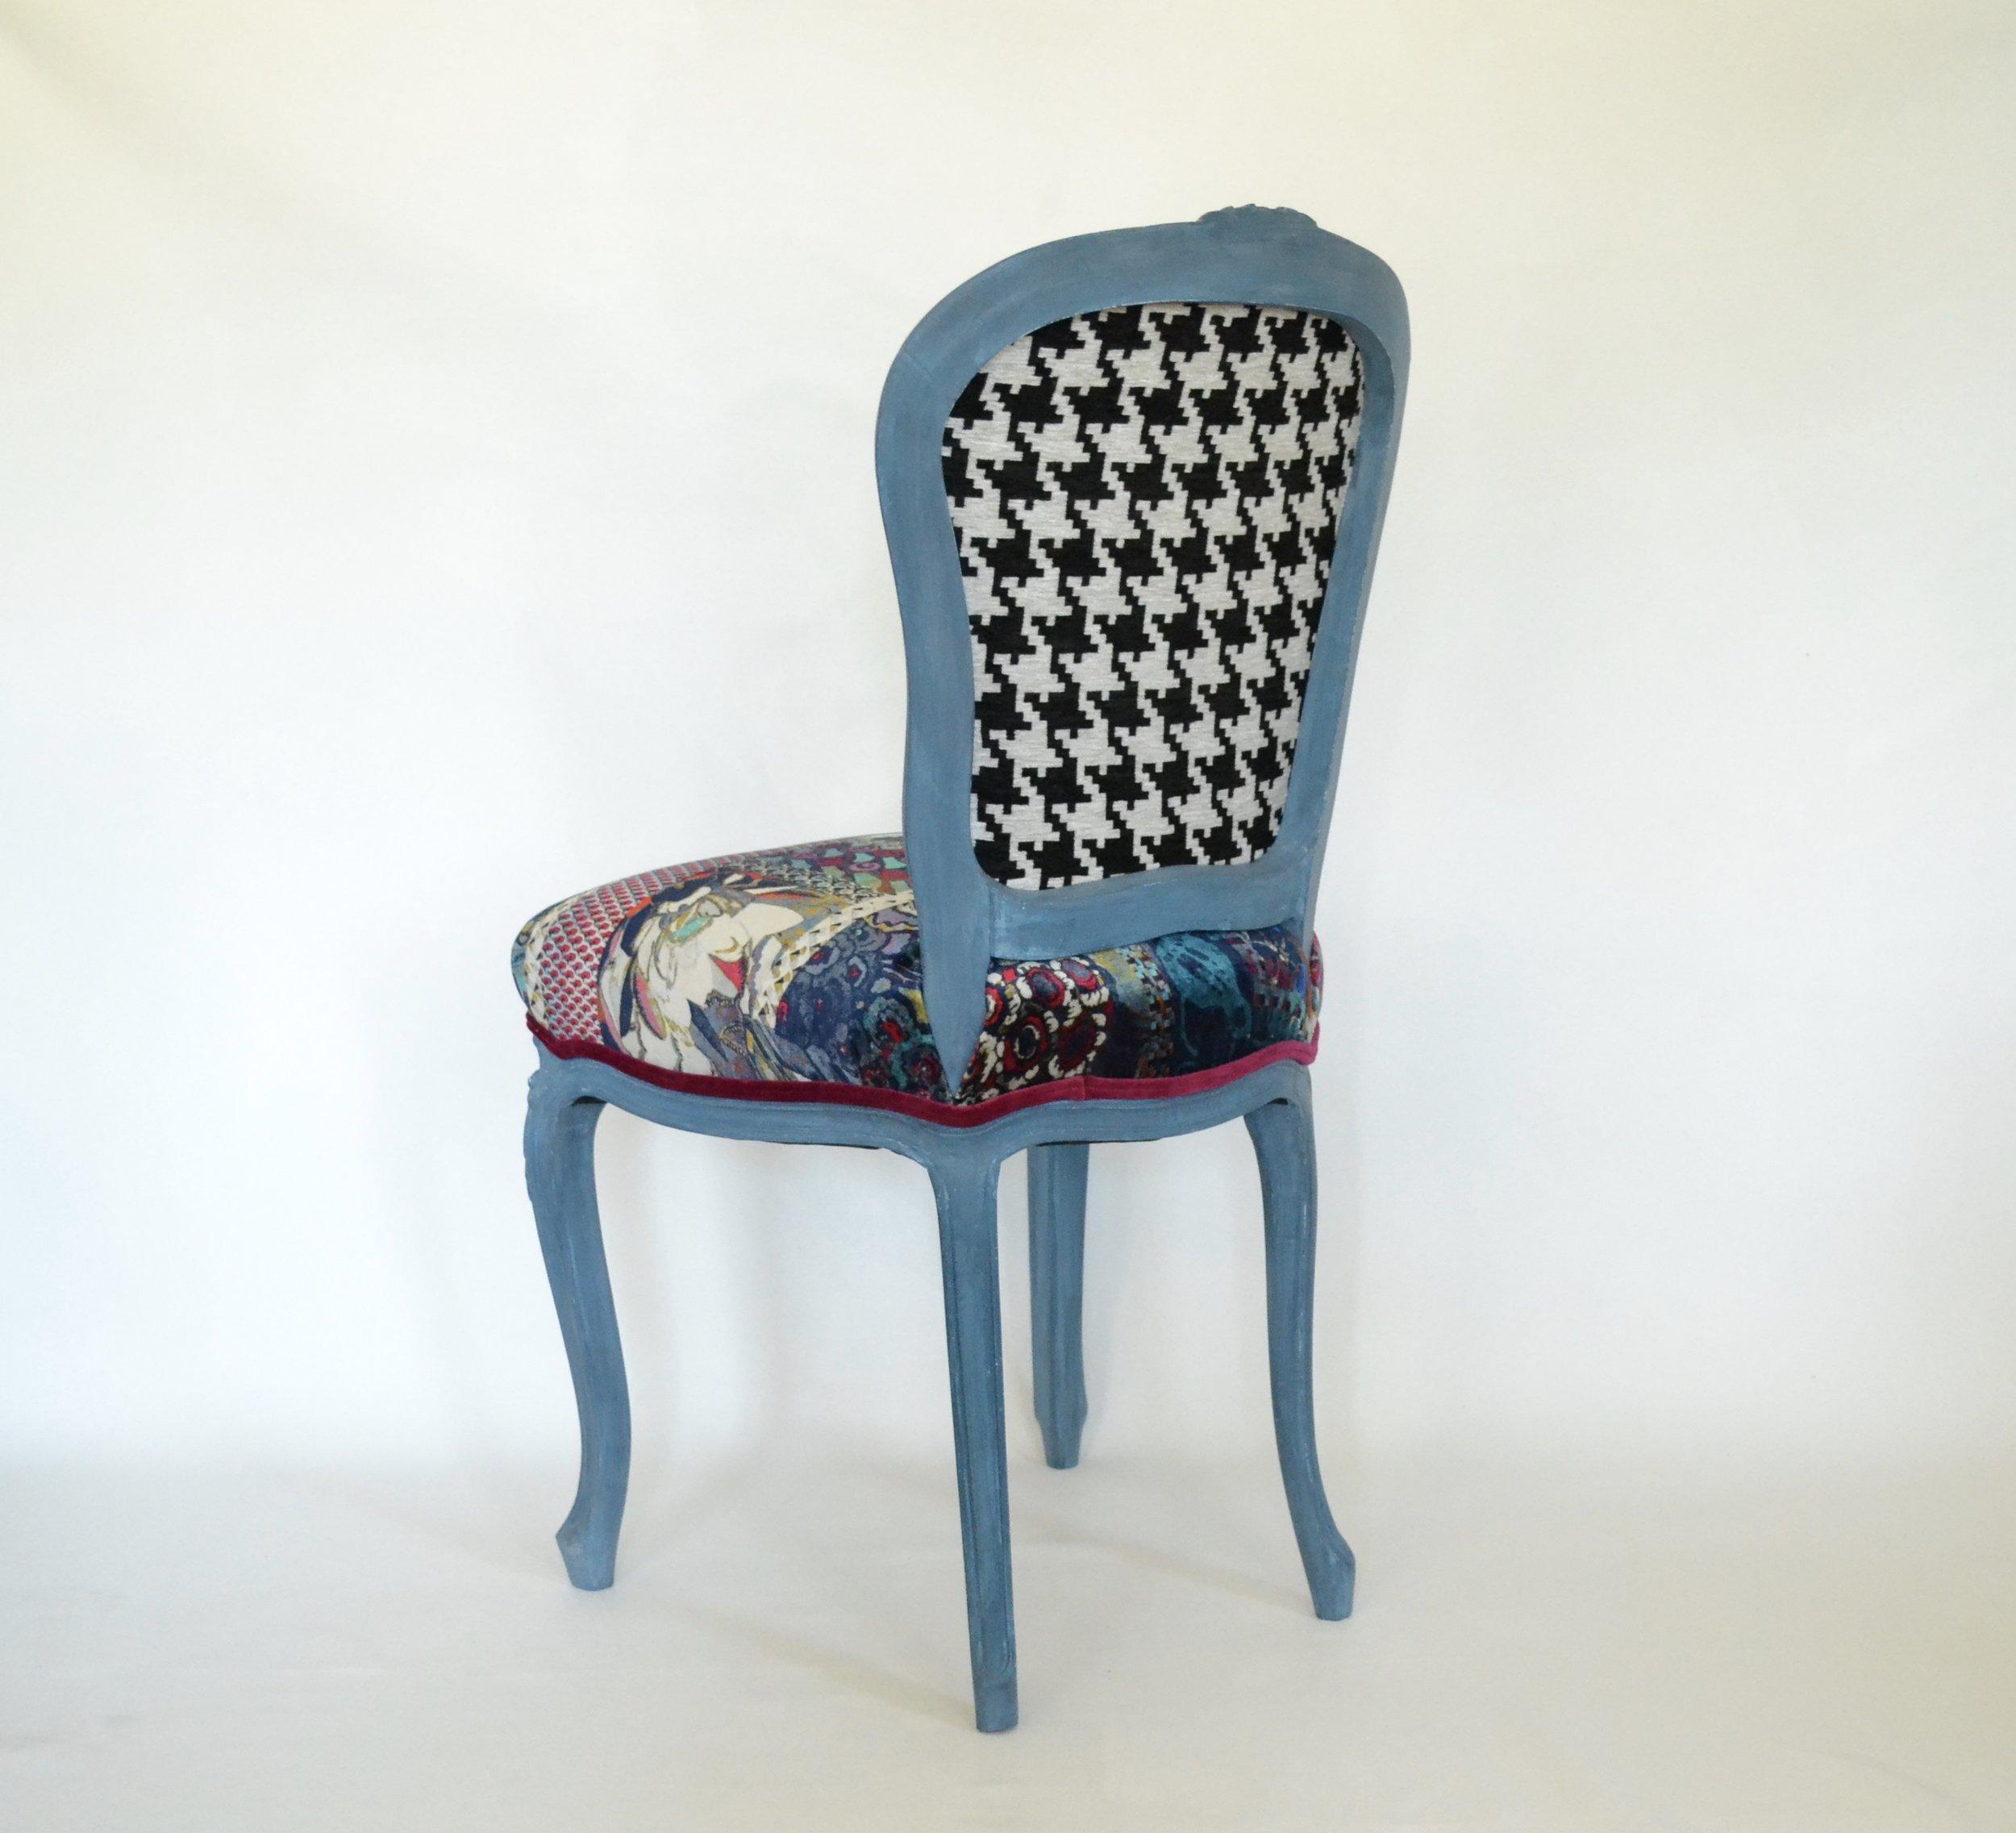 City Girl Arts upholstered boho french chair